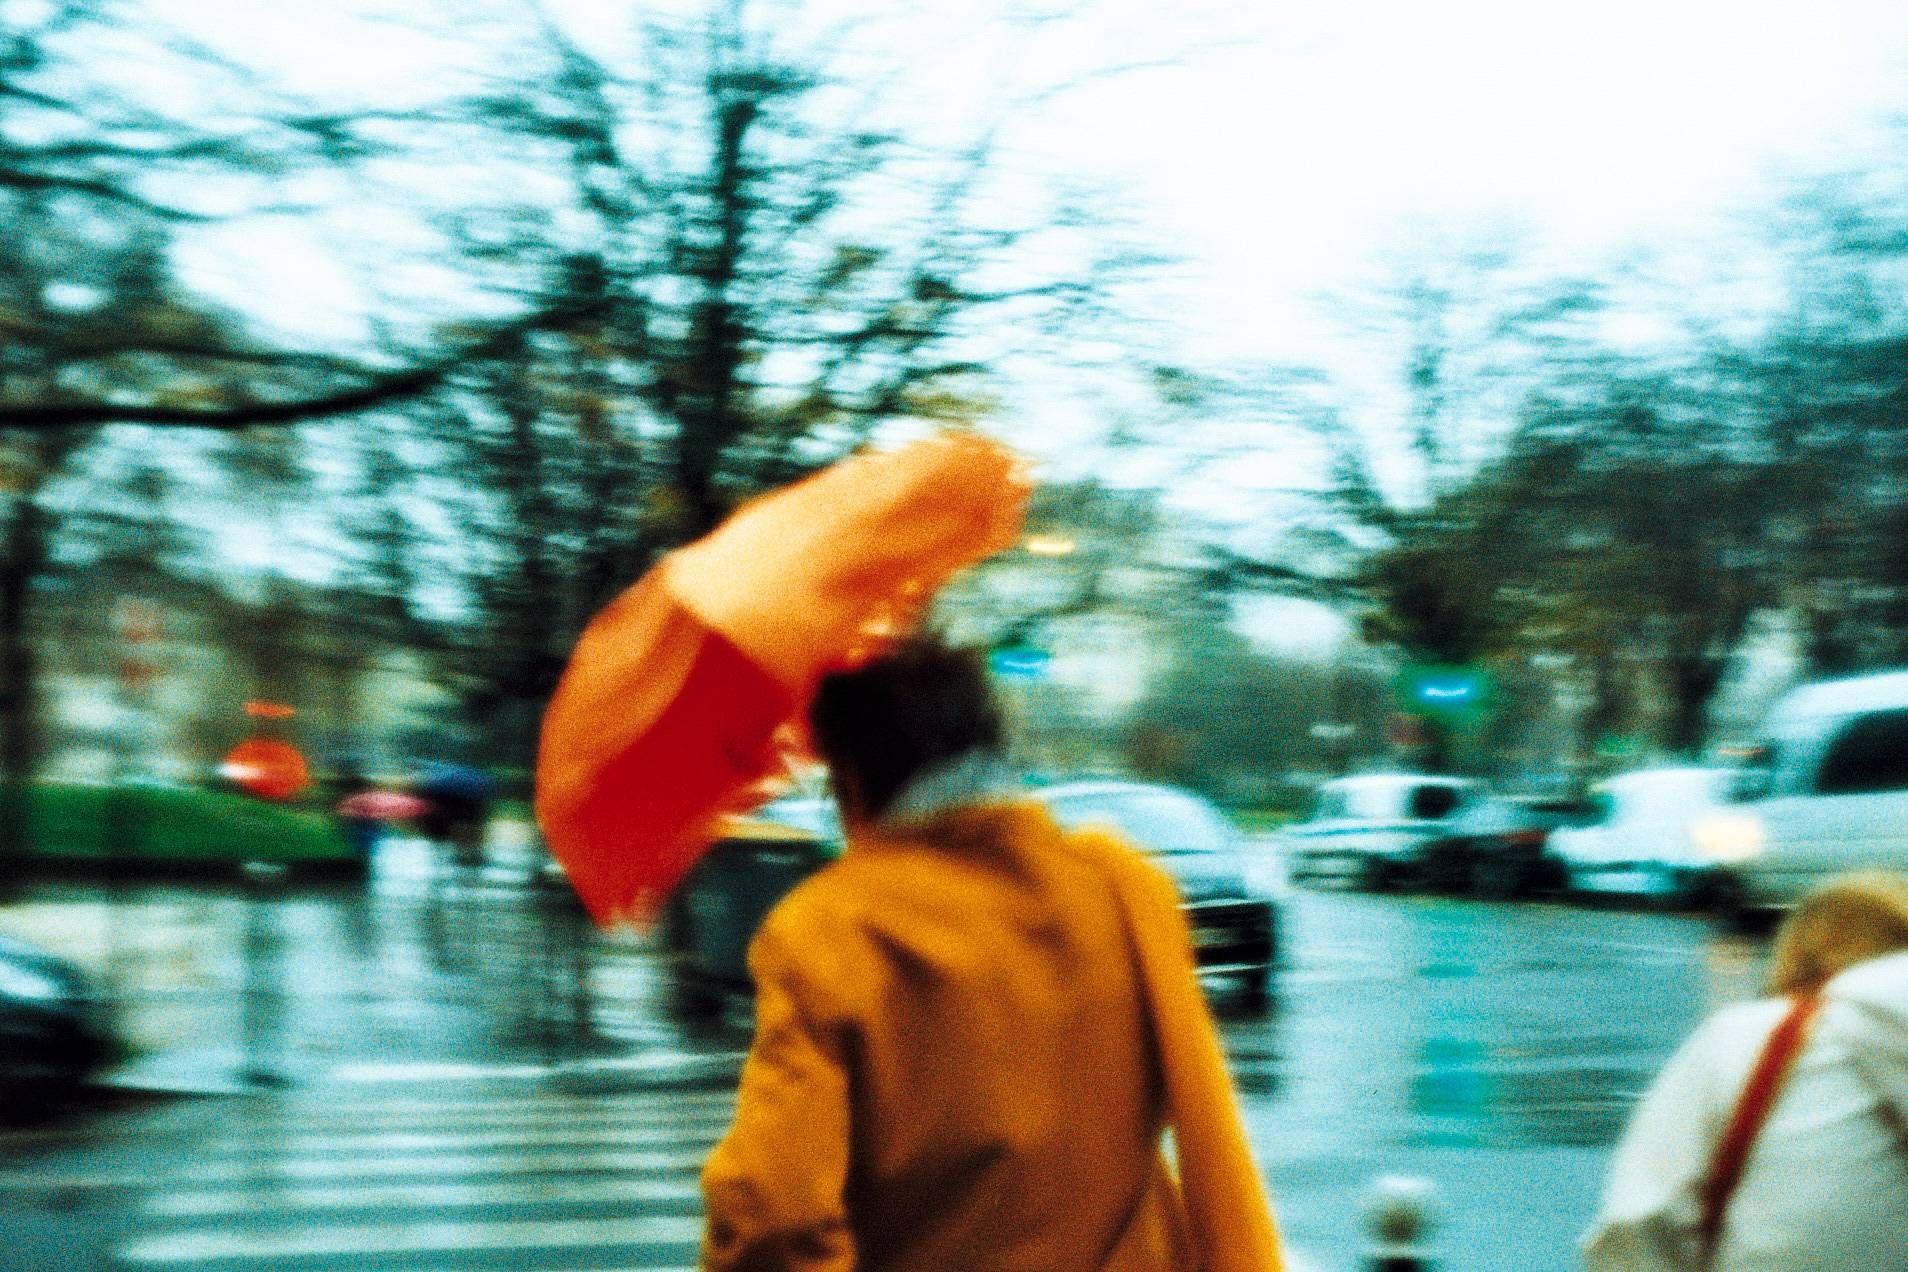 Photo Under my umbrella by theblues.